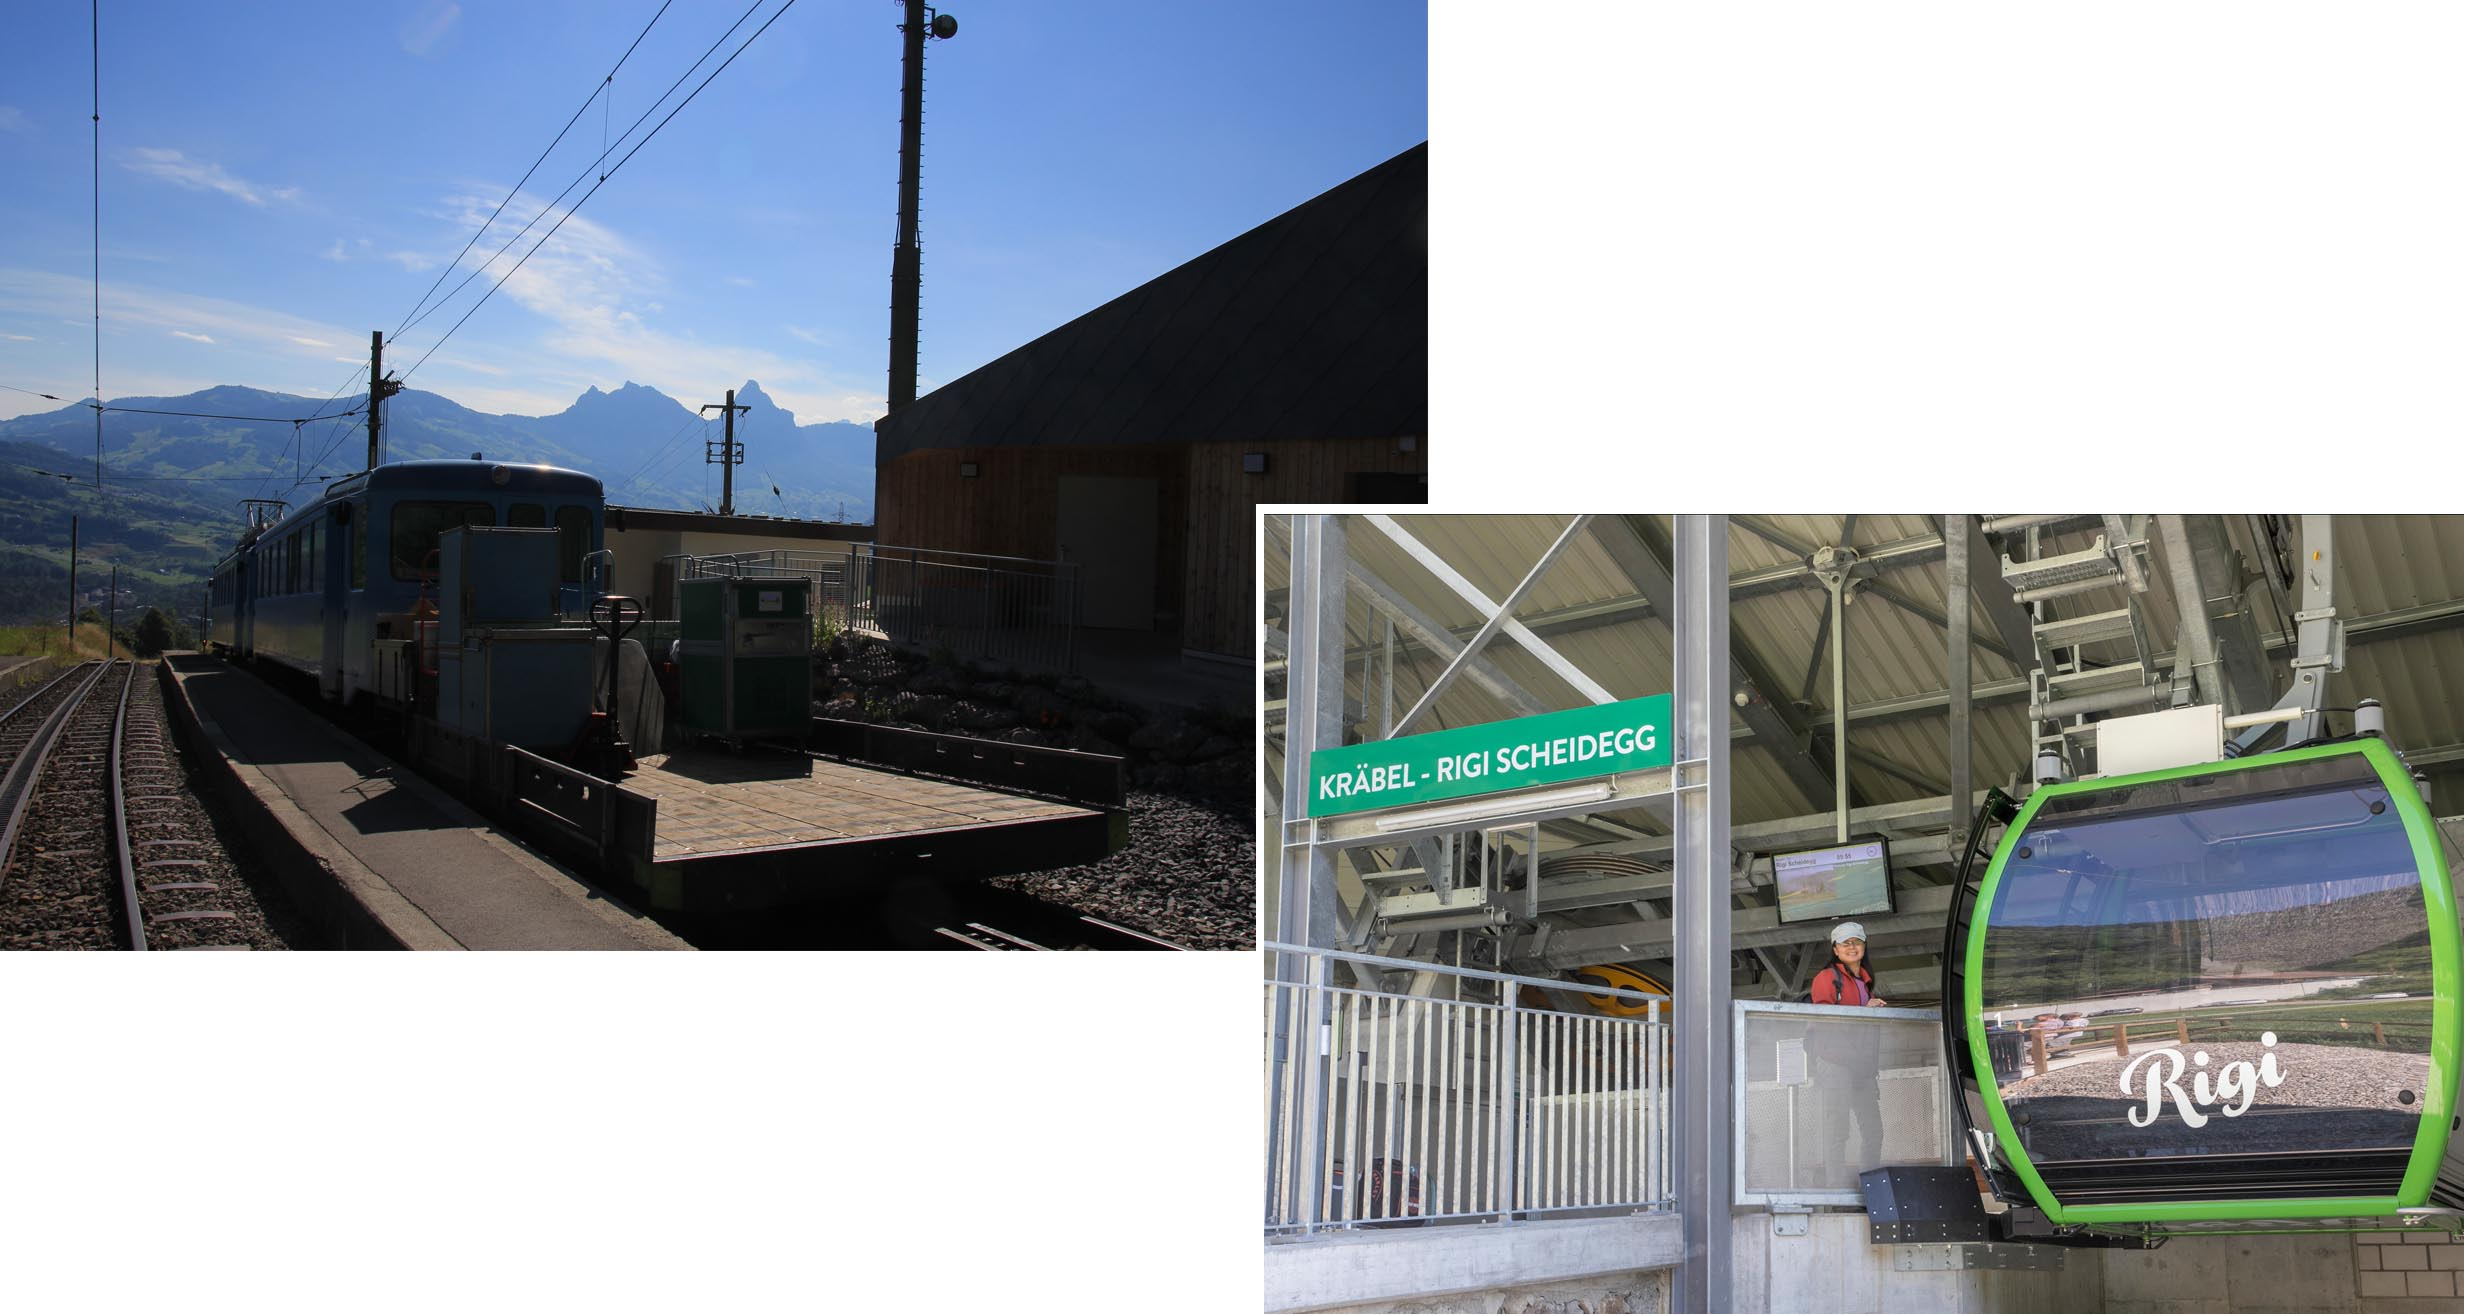 Krabel Station and Cable car station